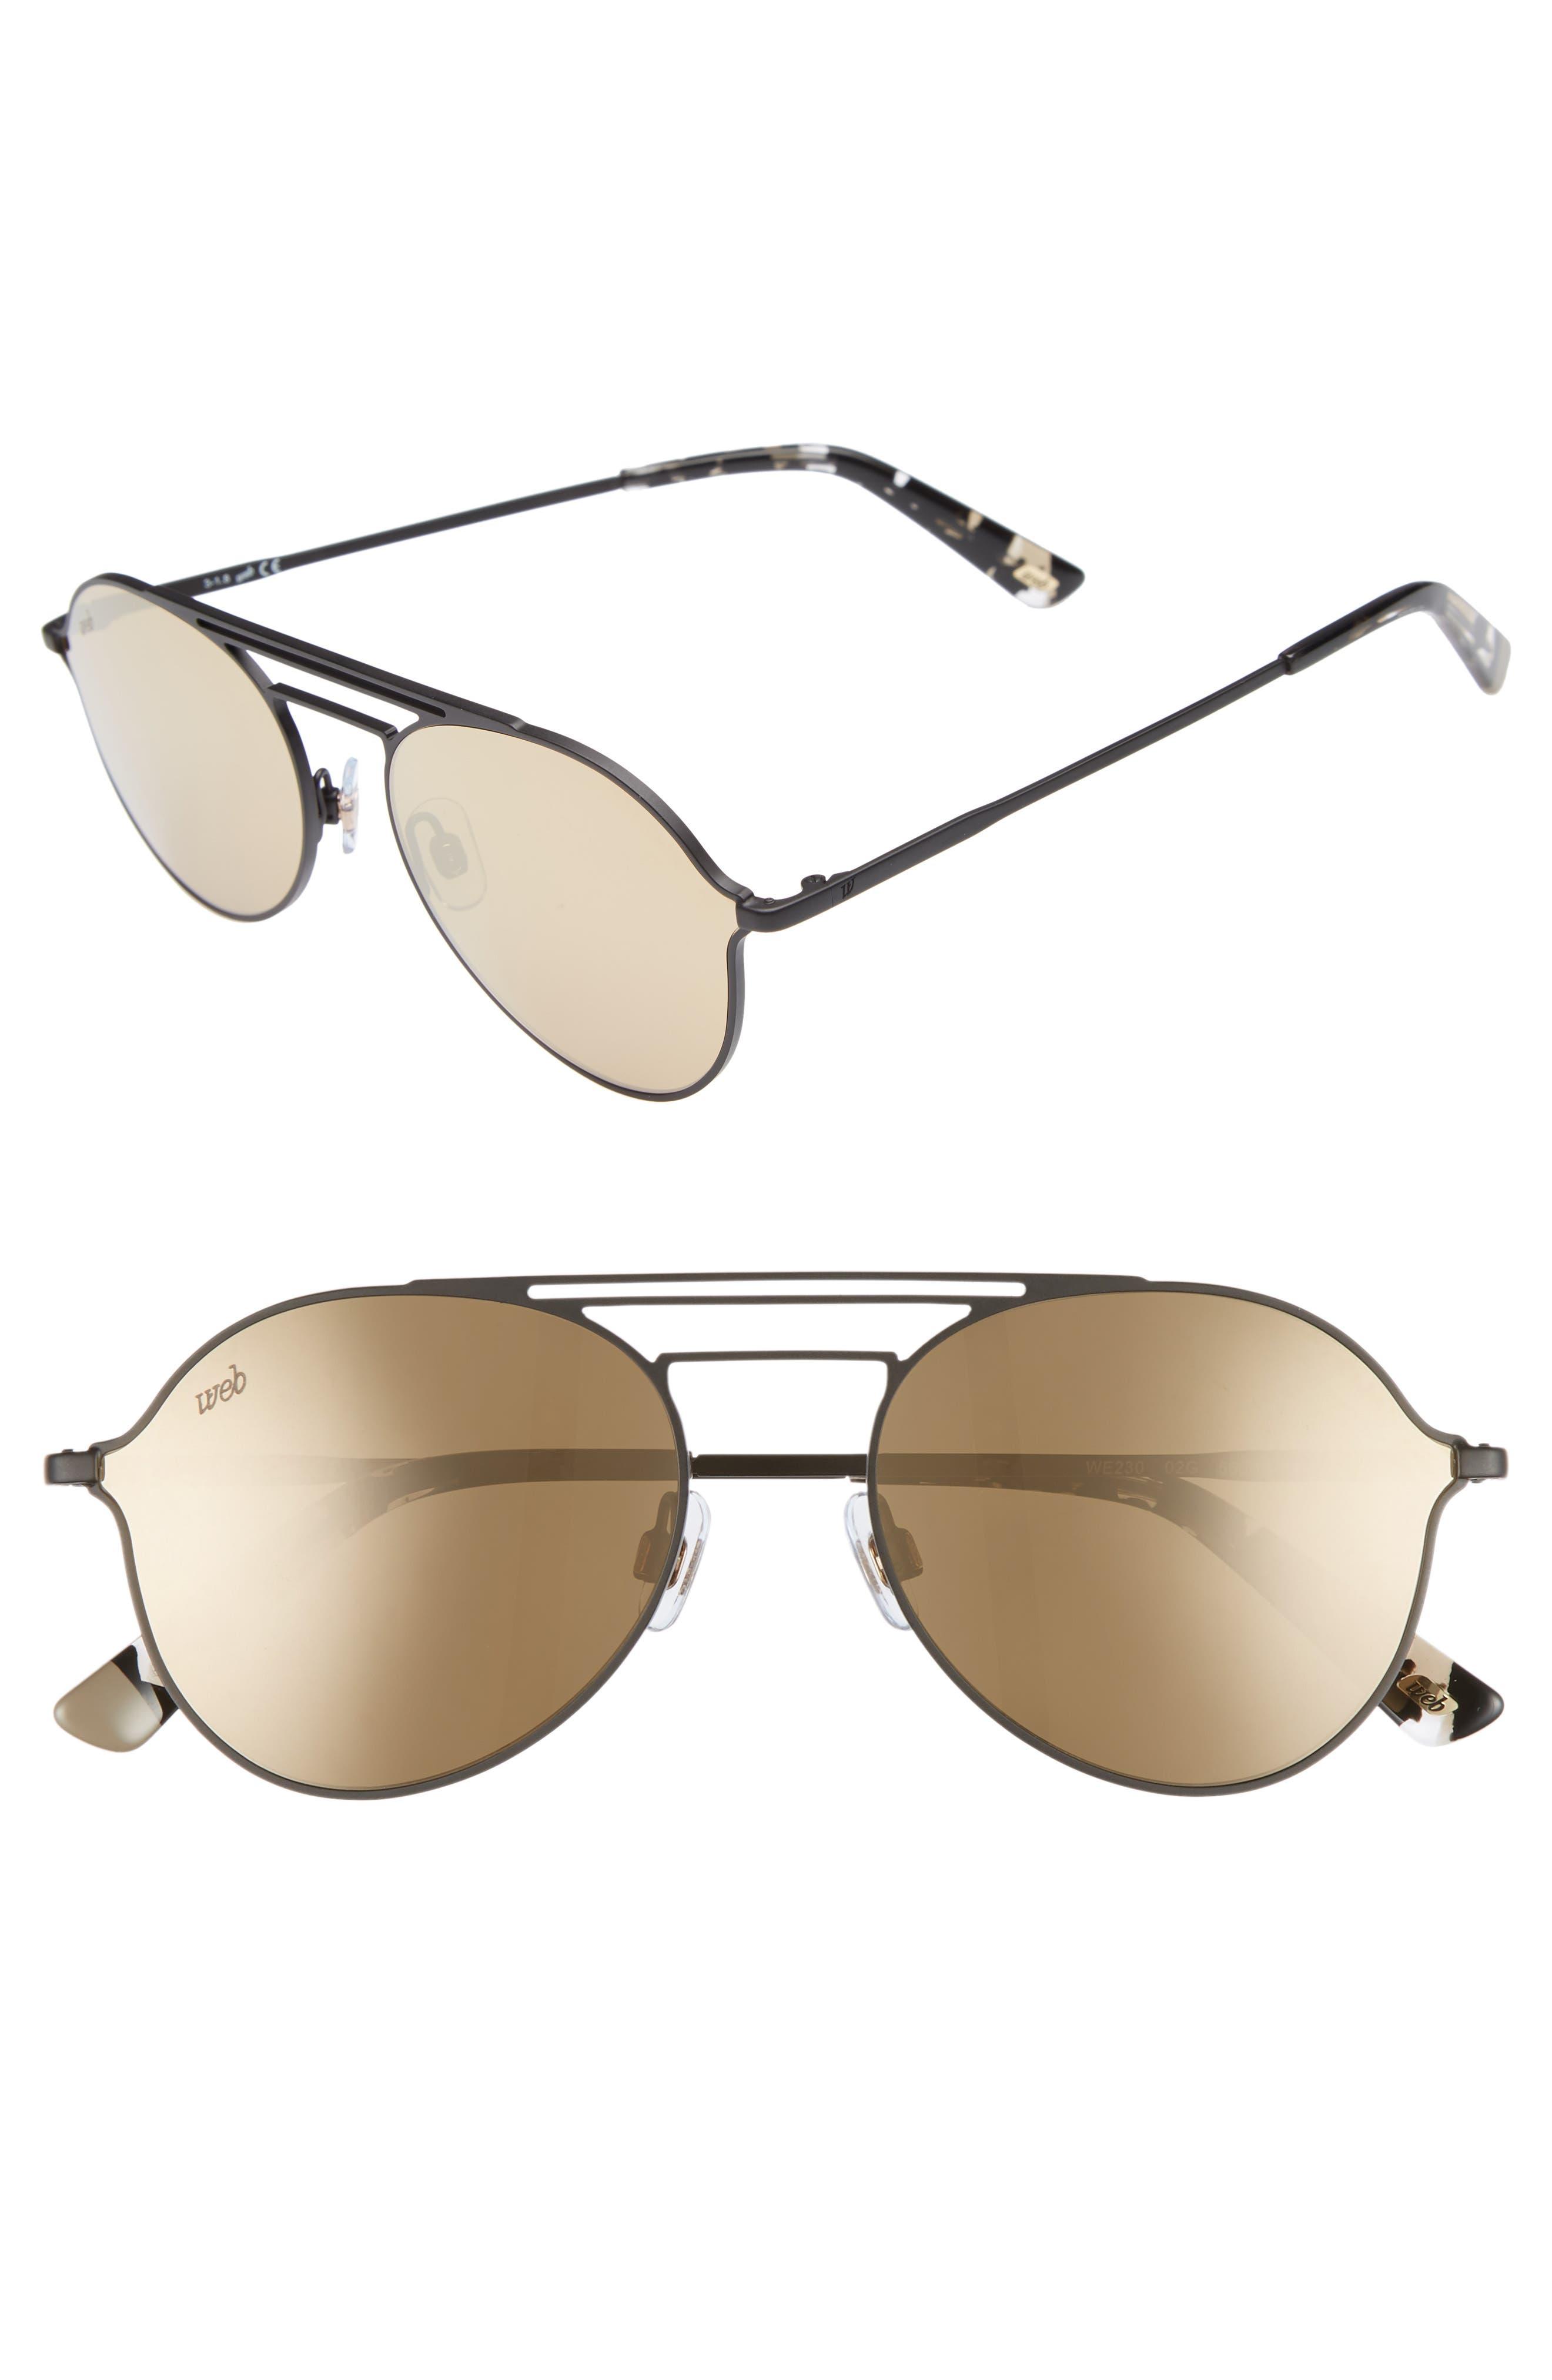 56mm Aviator Sunglasses,                             Main thumbnail 1, color,                             MATTE BLACK/ BROWN MIRROR